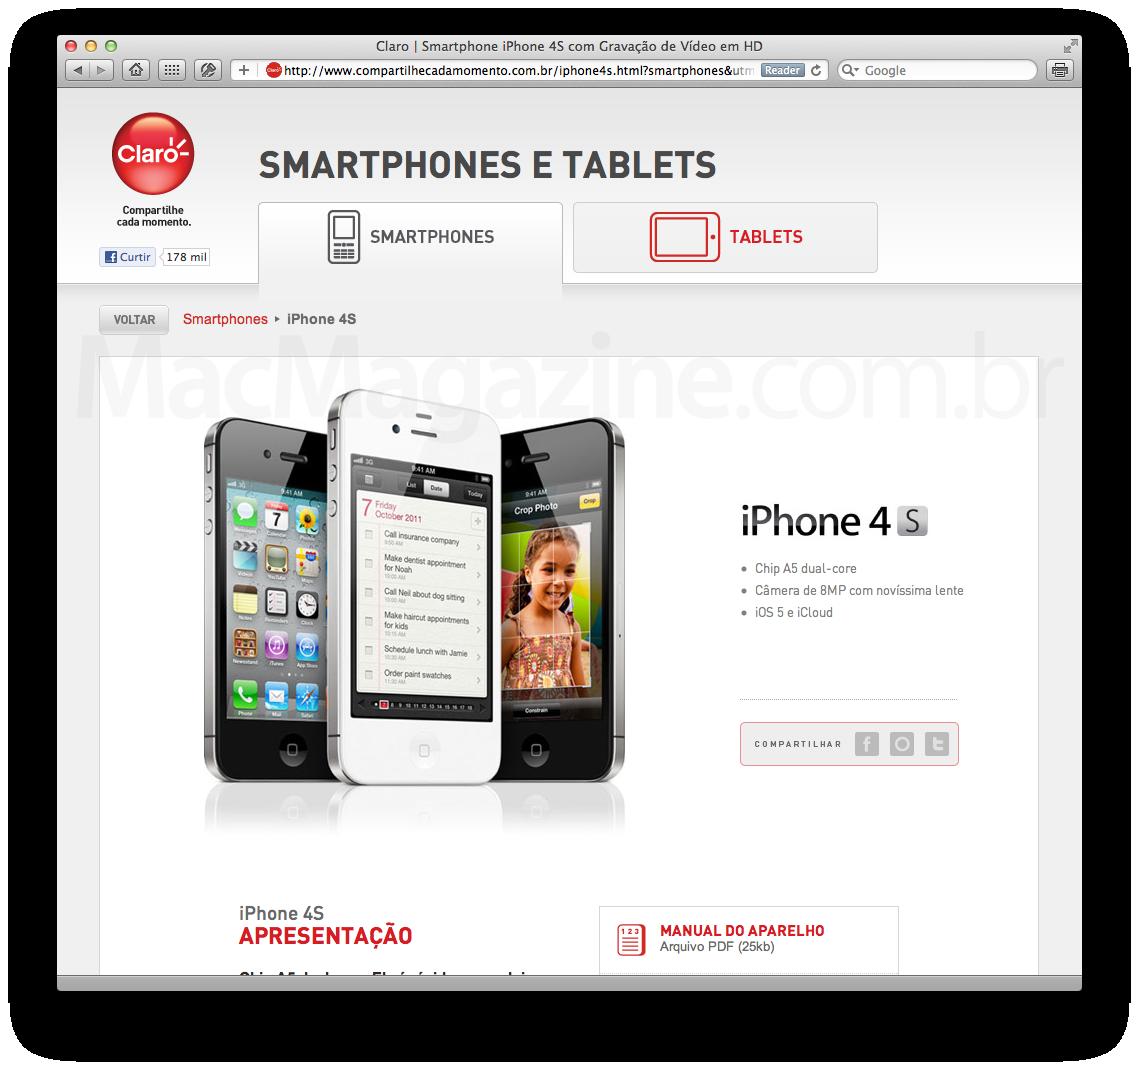 Cadastro do iPhone 4S na Claro